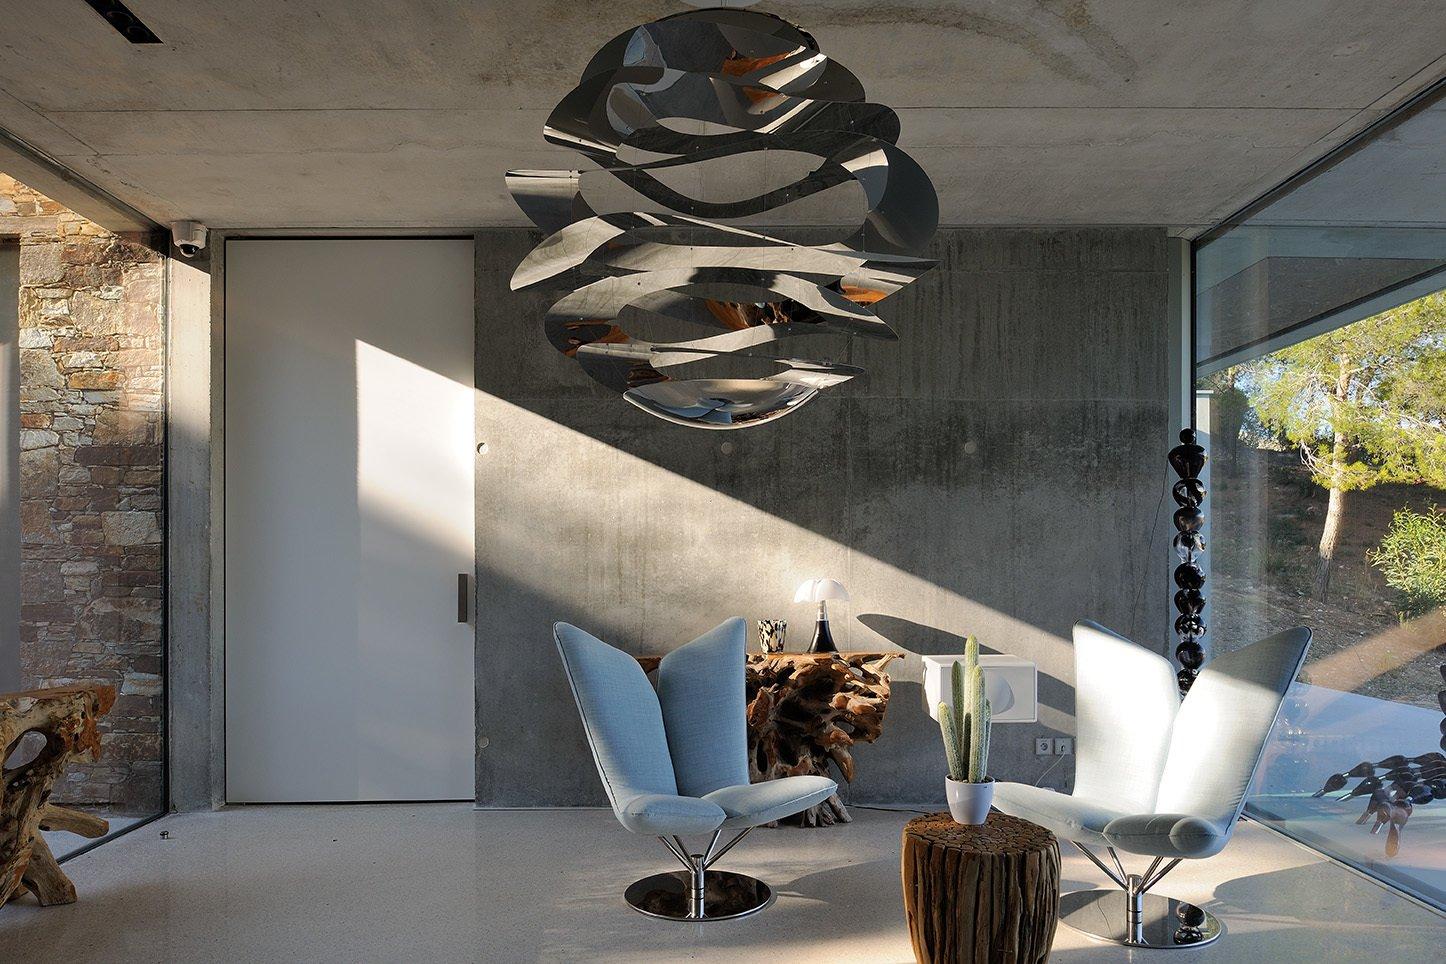 Living Room, Sofa, Ceiling Lighting, Concrete Floor, Recessed Lighting, Pendant Lighting, Console Tables, End Tables, and Table Lighting Entering the house.  La Mira Ra